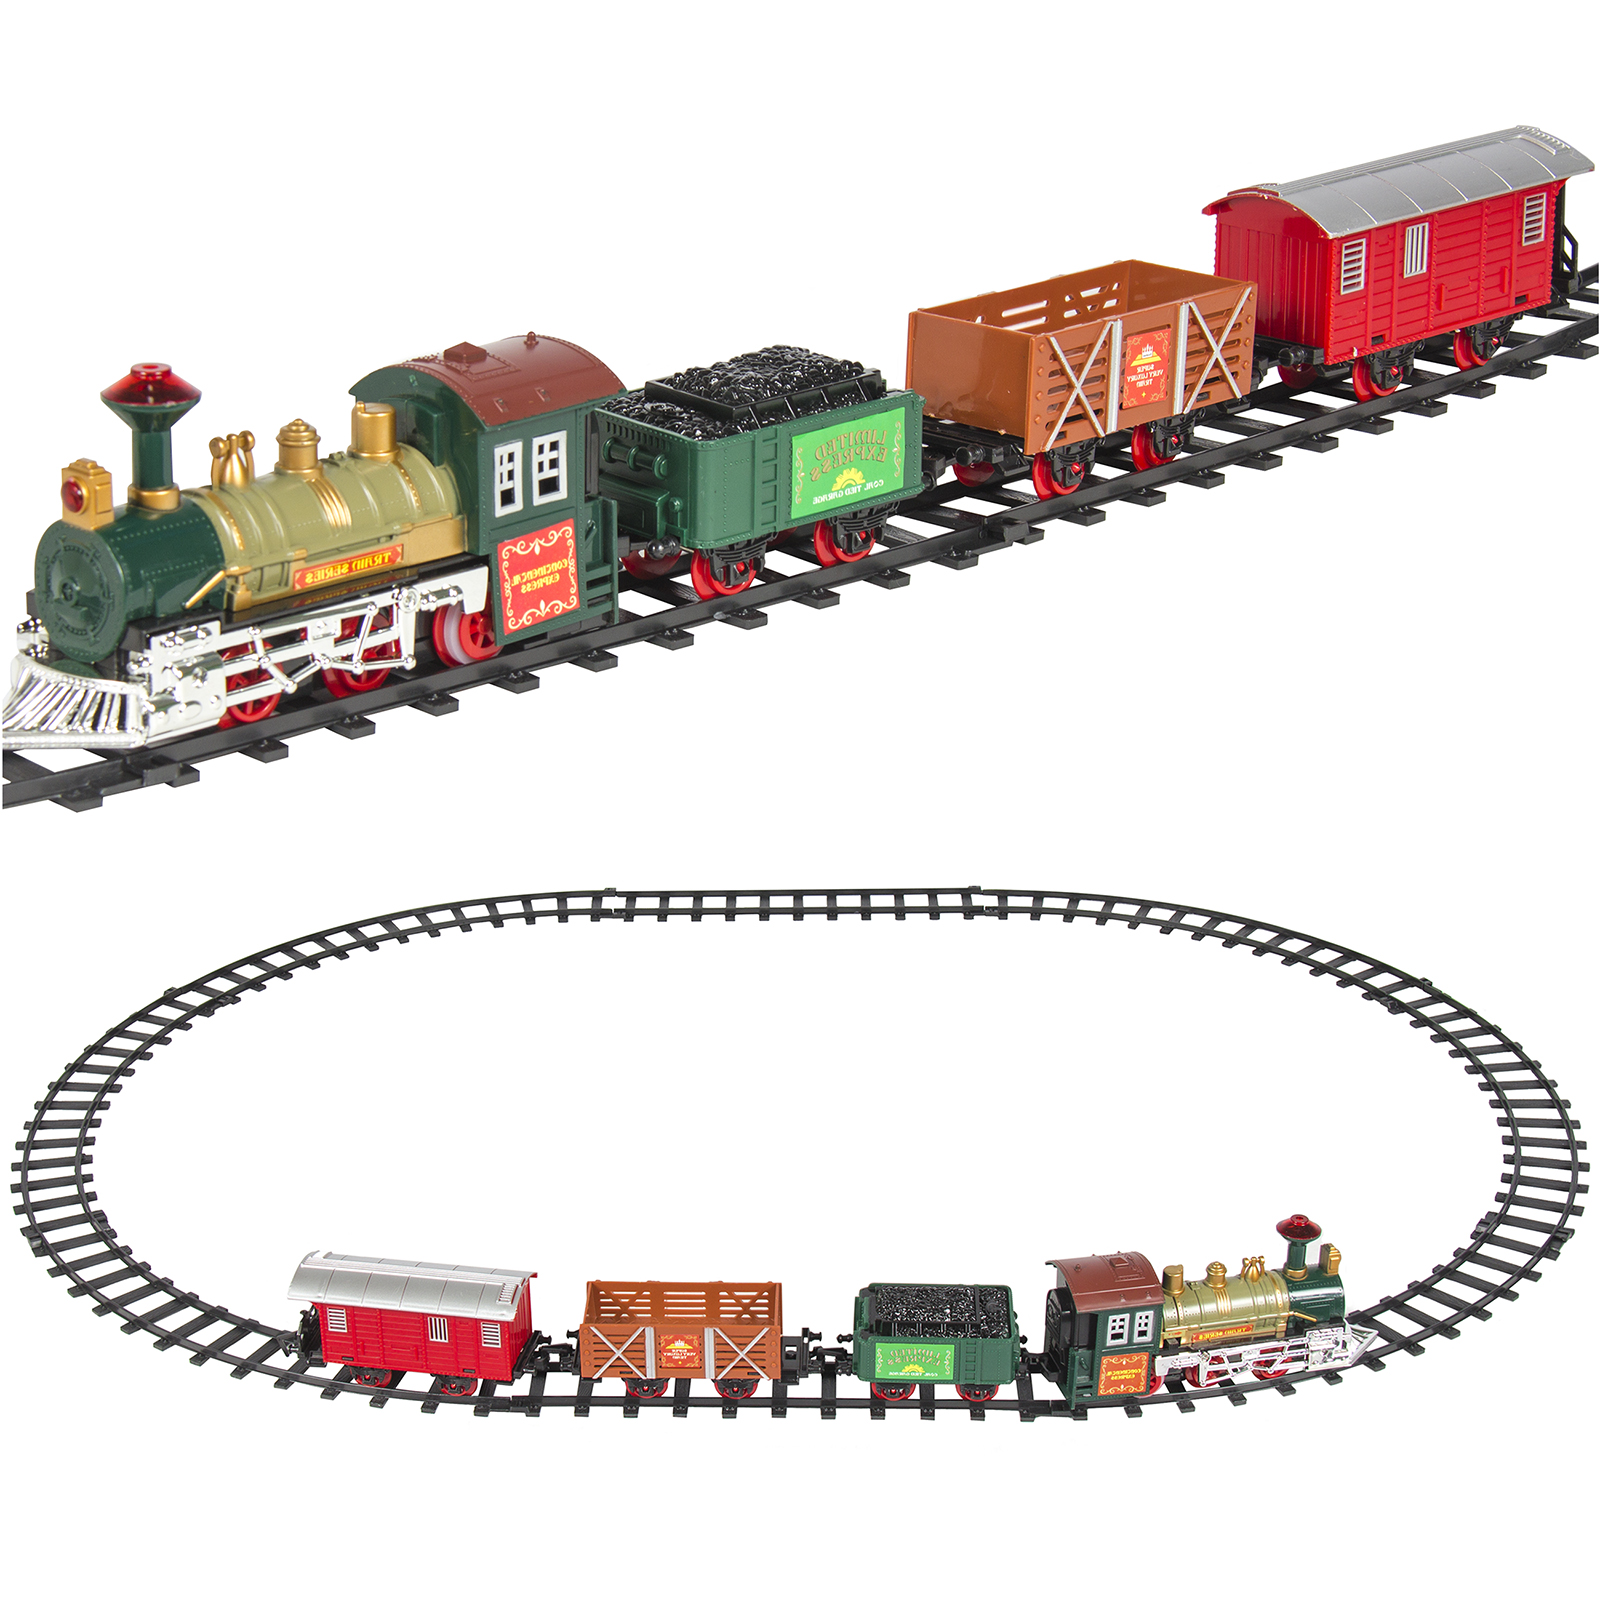 Best Choice Products Kids Classic Electric Railway Train Car Track Play Set Toy w/ Music, Lights - Walmart.com